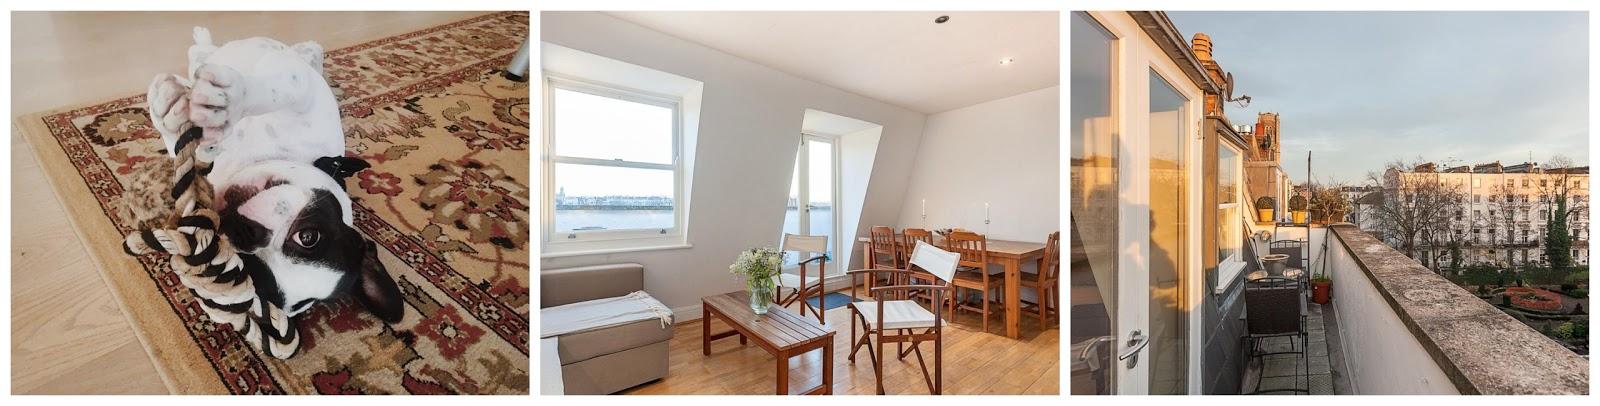 House Sitting Opportunities luxury long term worldwide